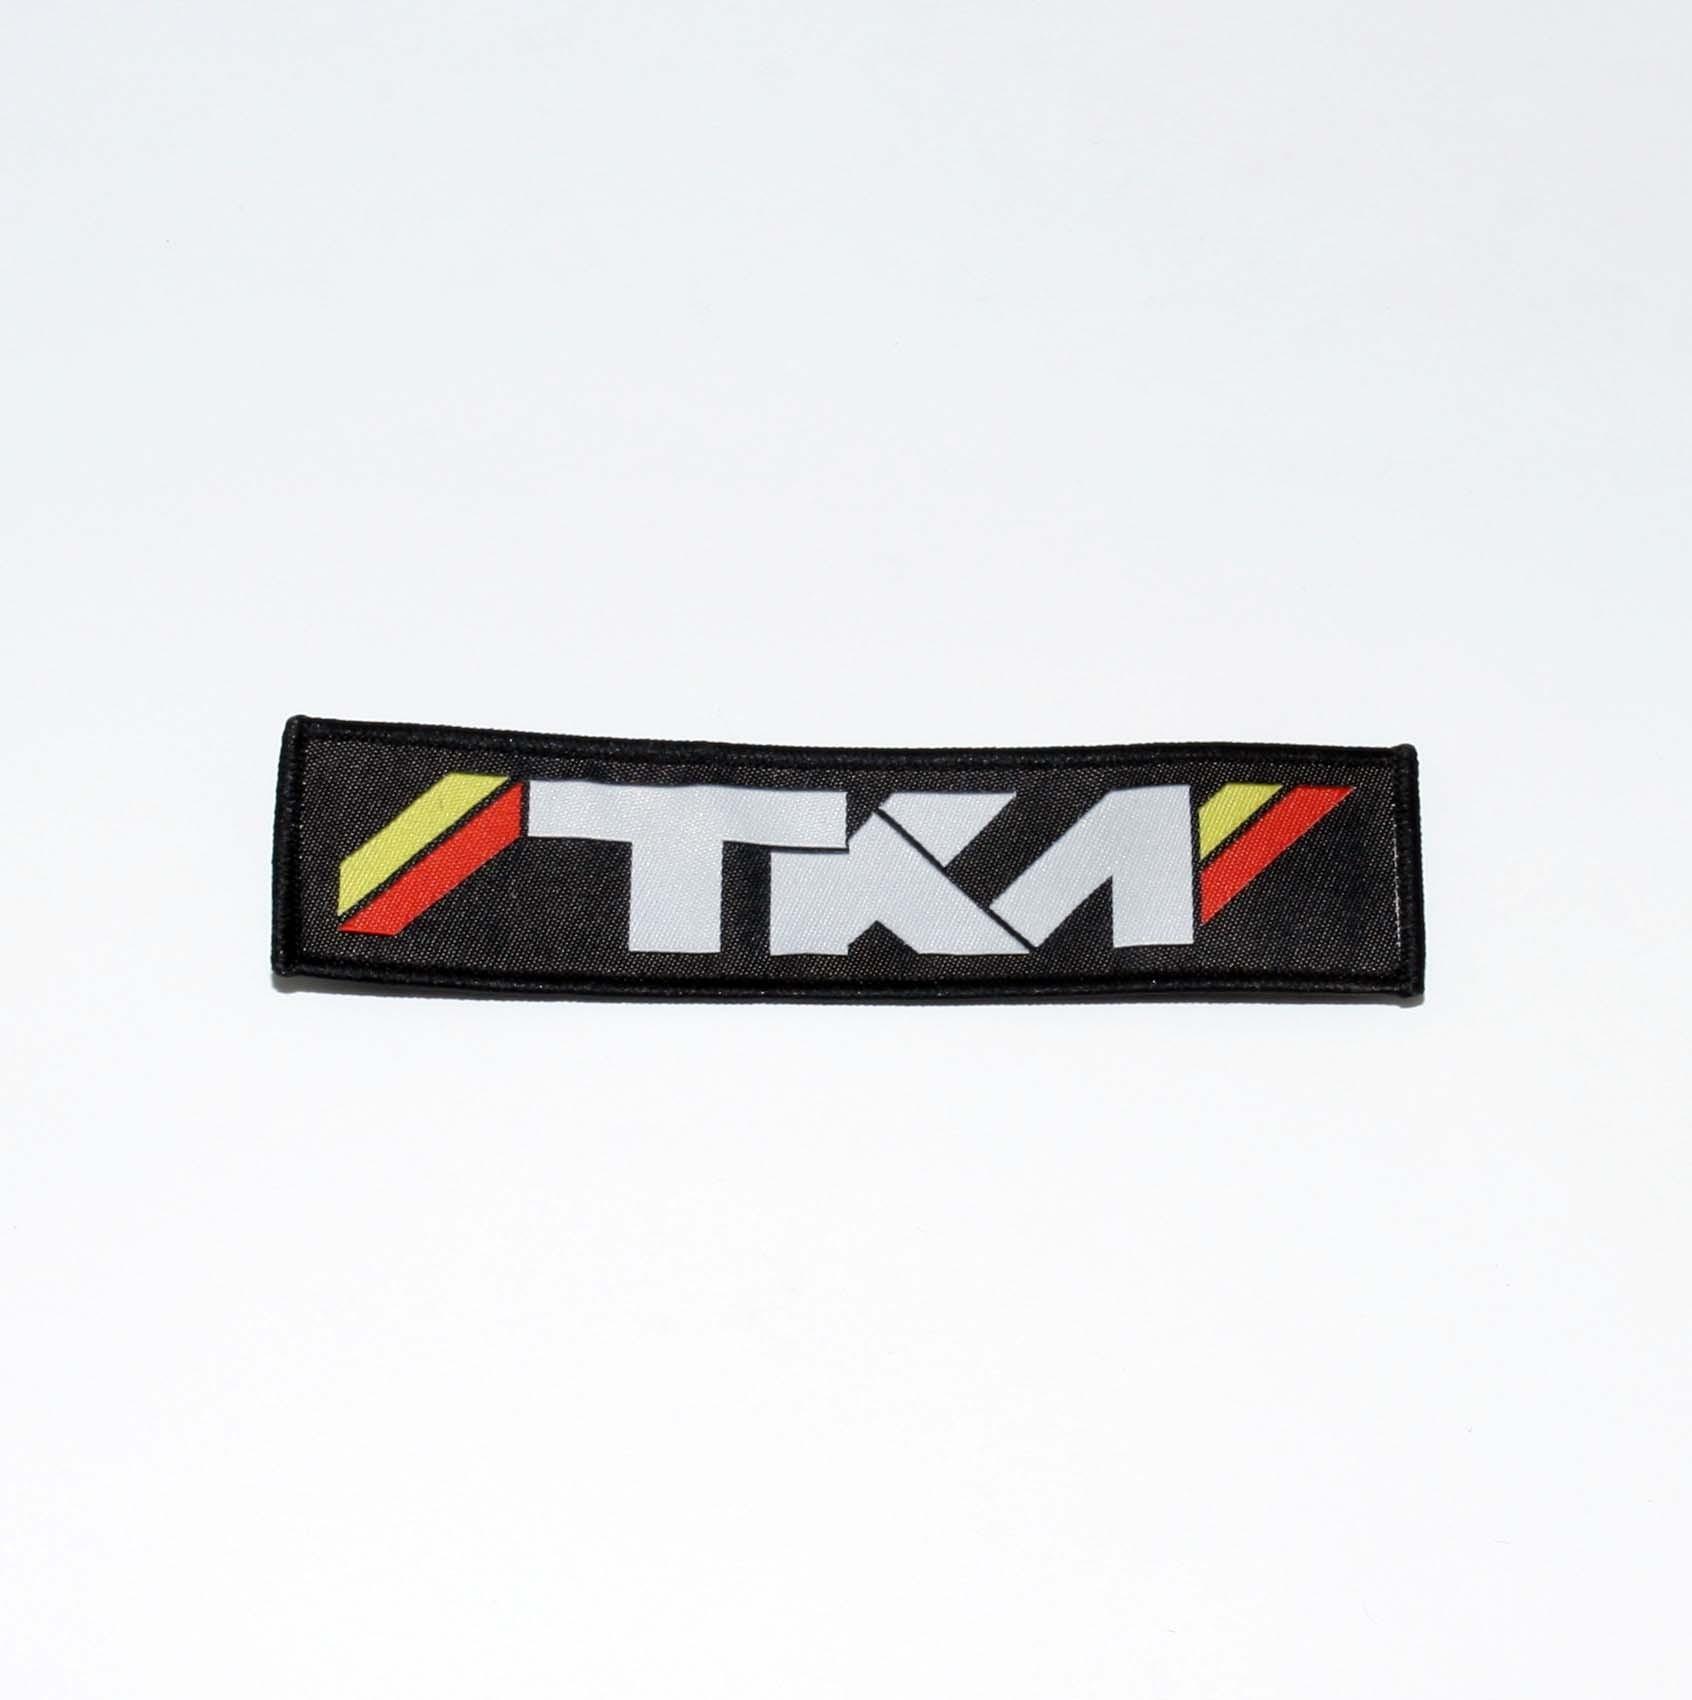 TKM RACESUIT BADGE 140 x 34